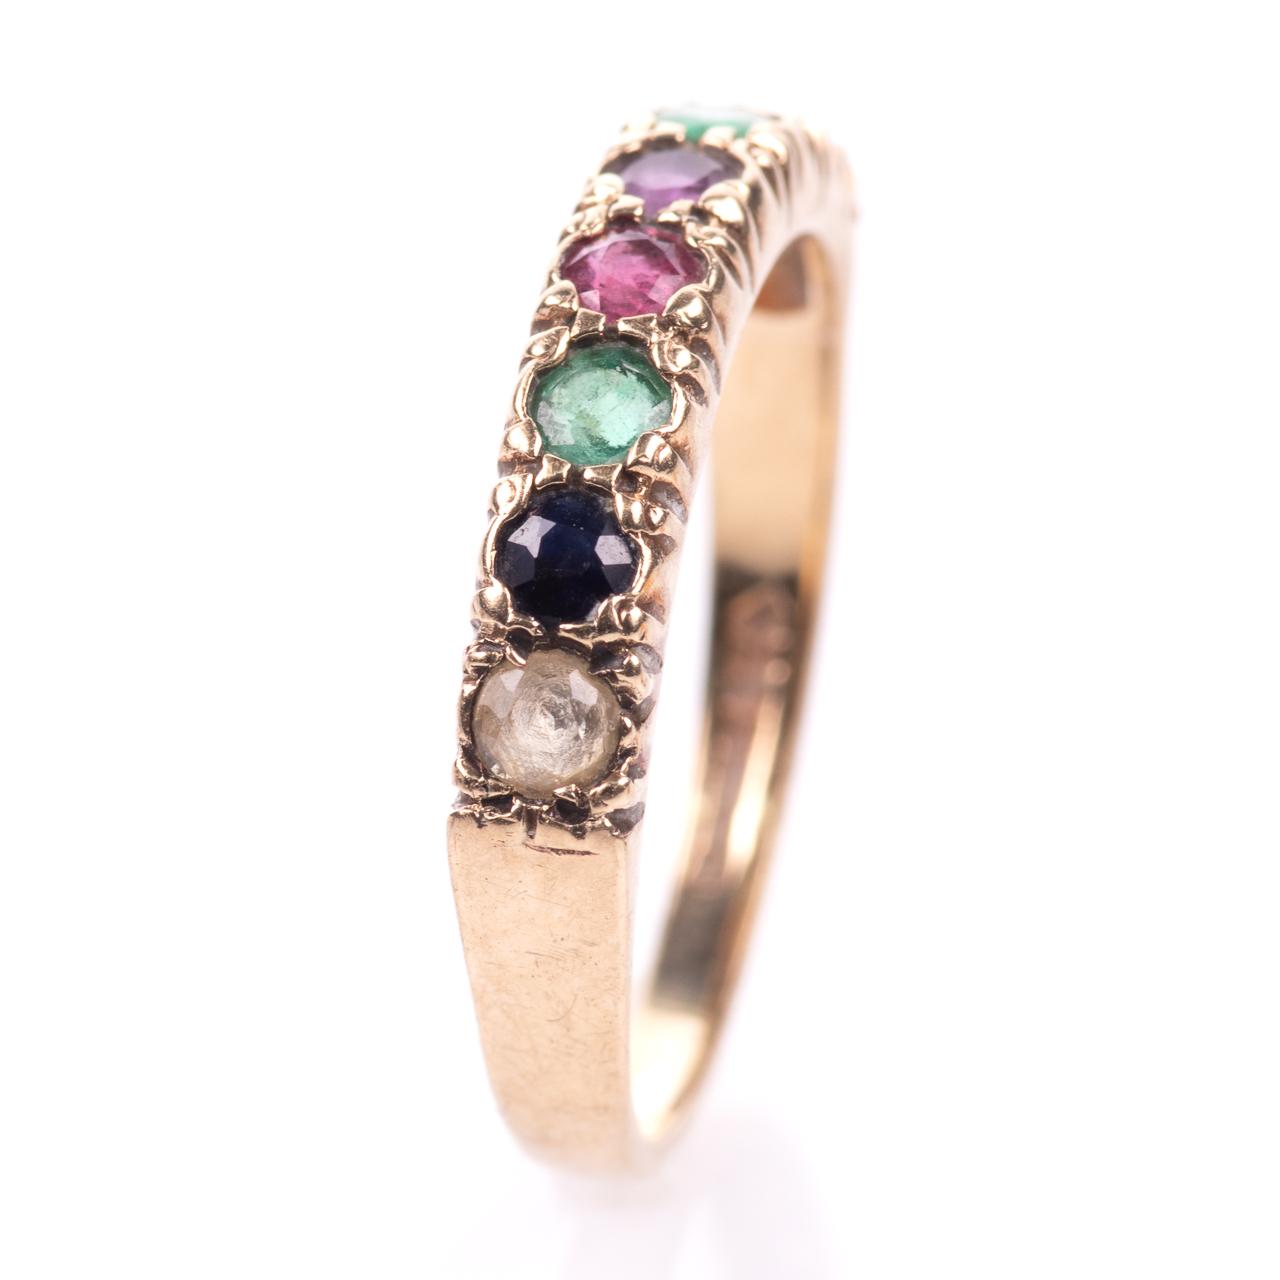 9ct Gold Emerald, Ruby, Amethyst, Sapphire & Diamond Ring